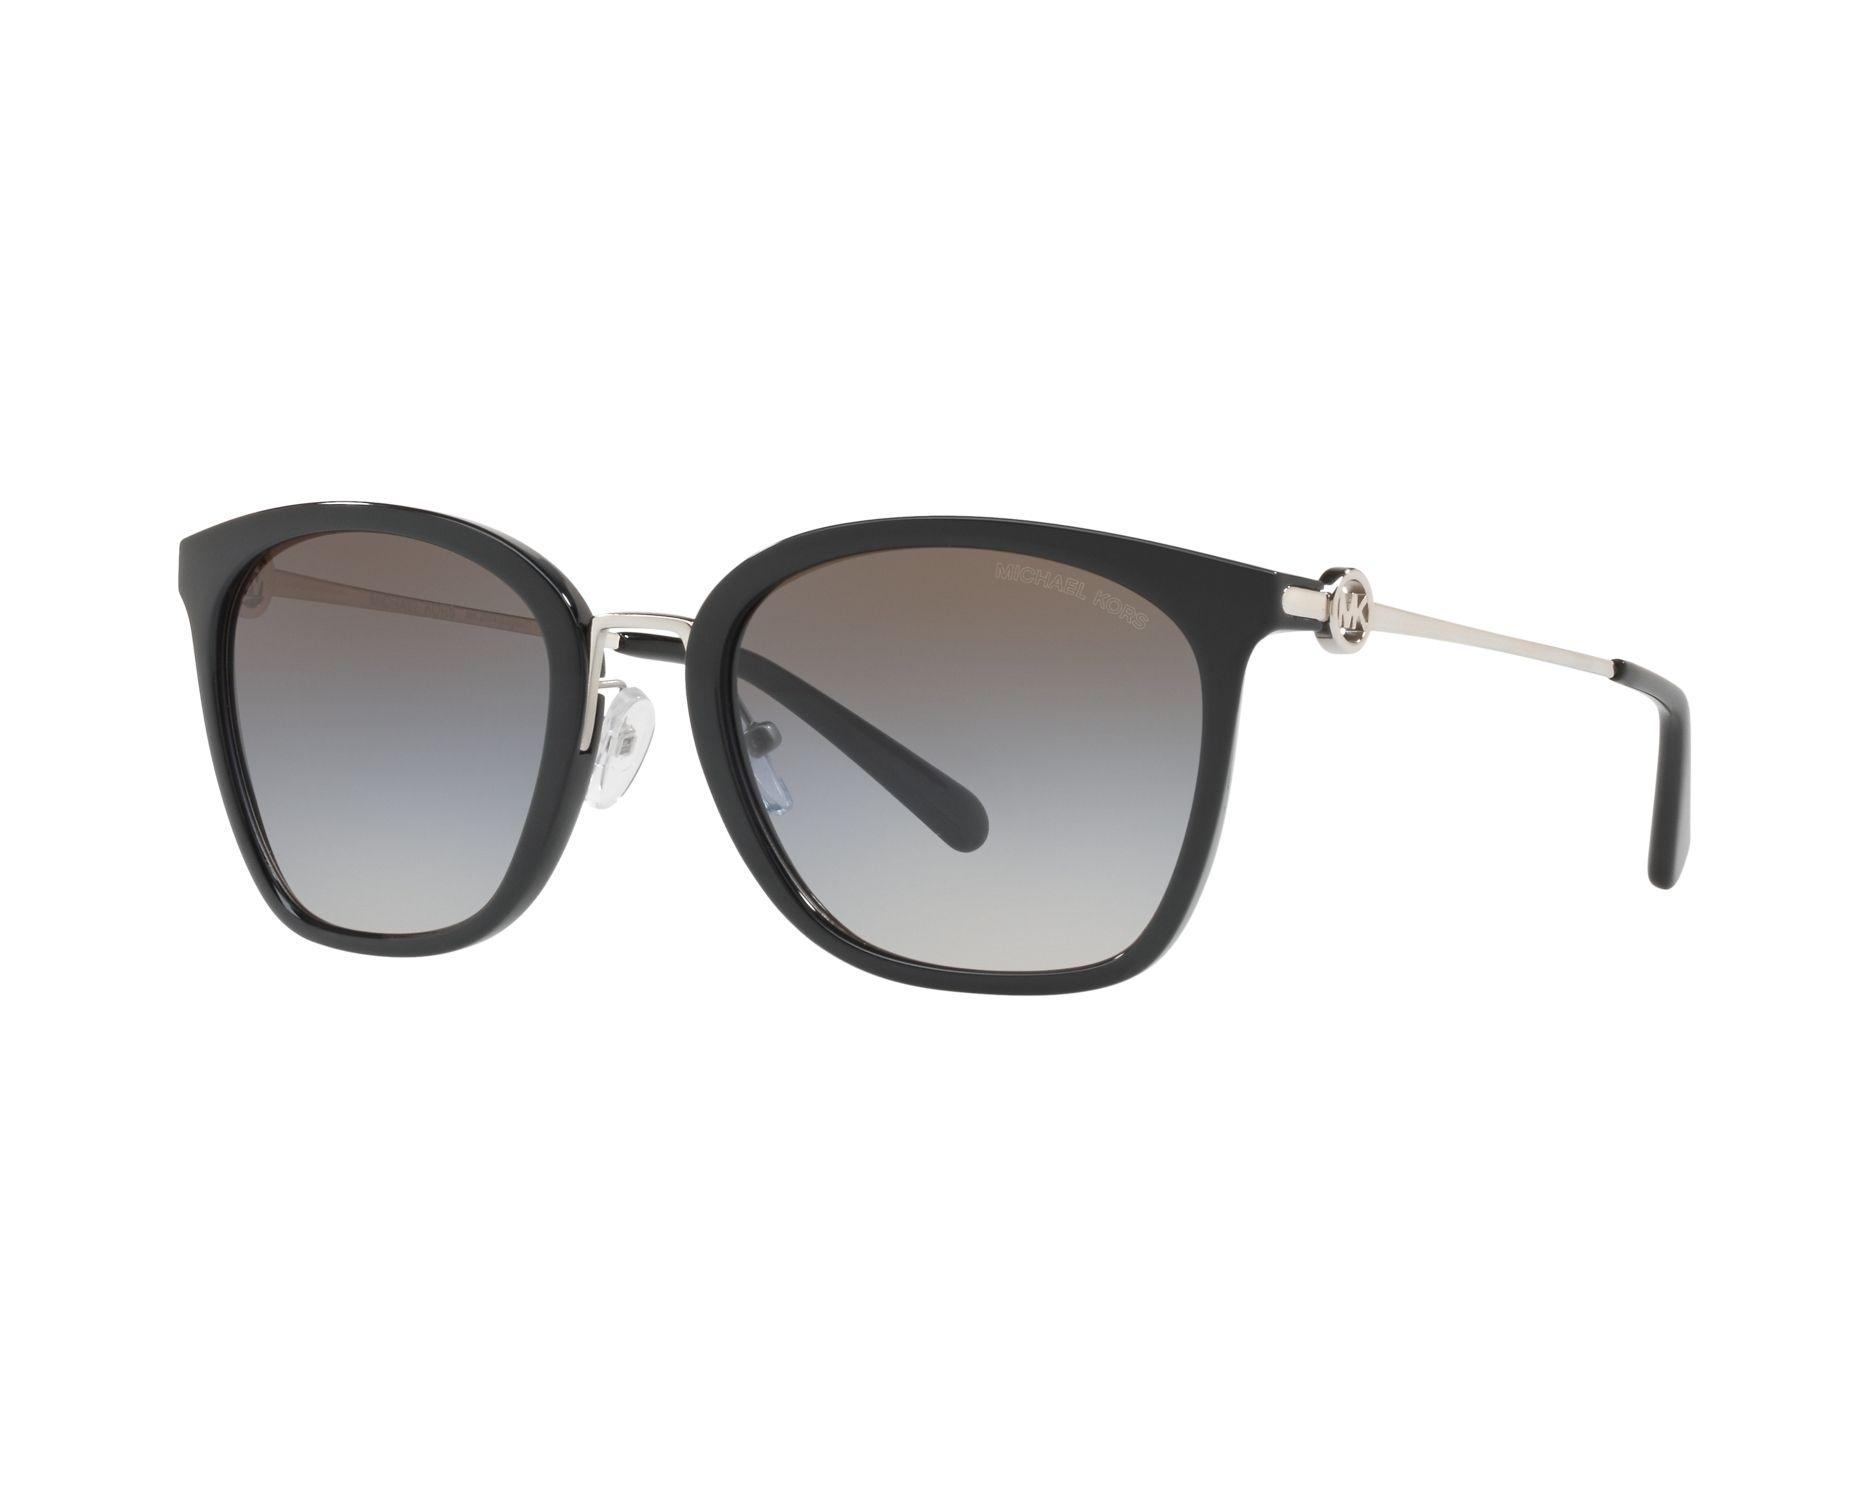 MICHAEL KORS Michael Kors Damen Sonnenbrille »LUGANO MK2064«, schwarz, 3005M0 - schwarz/ blau